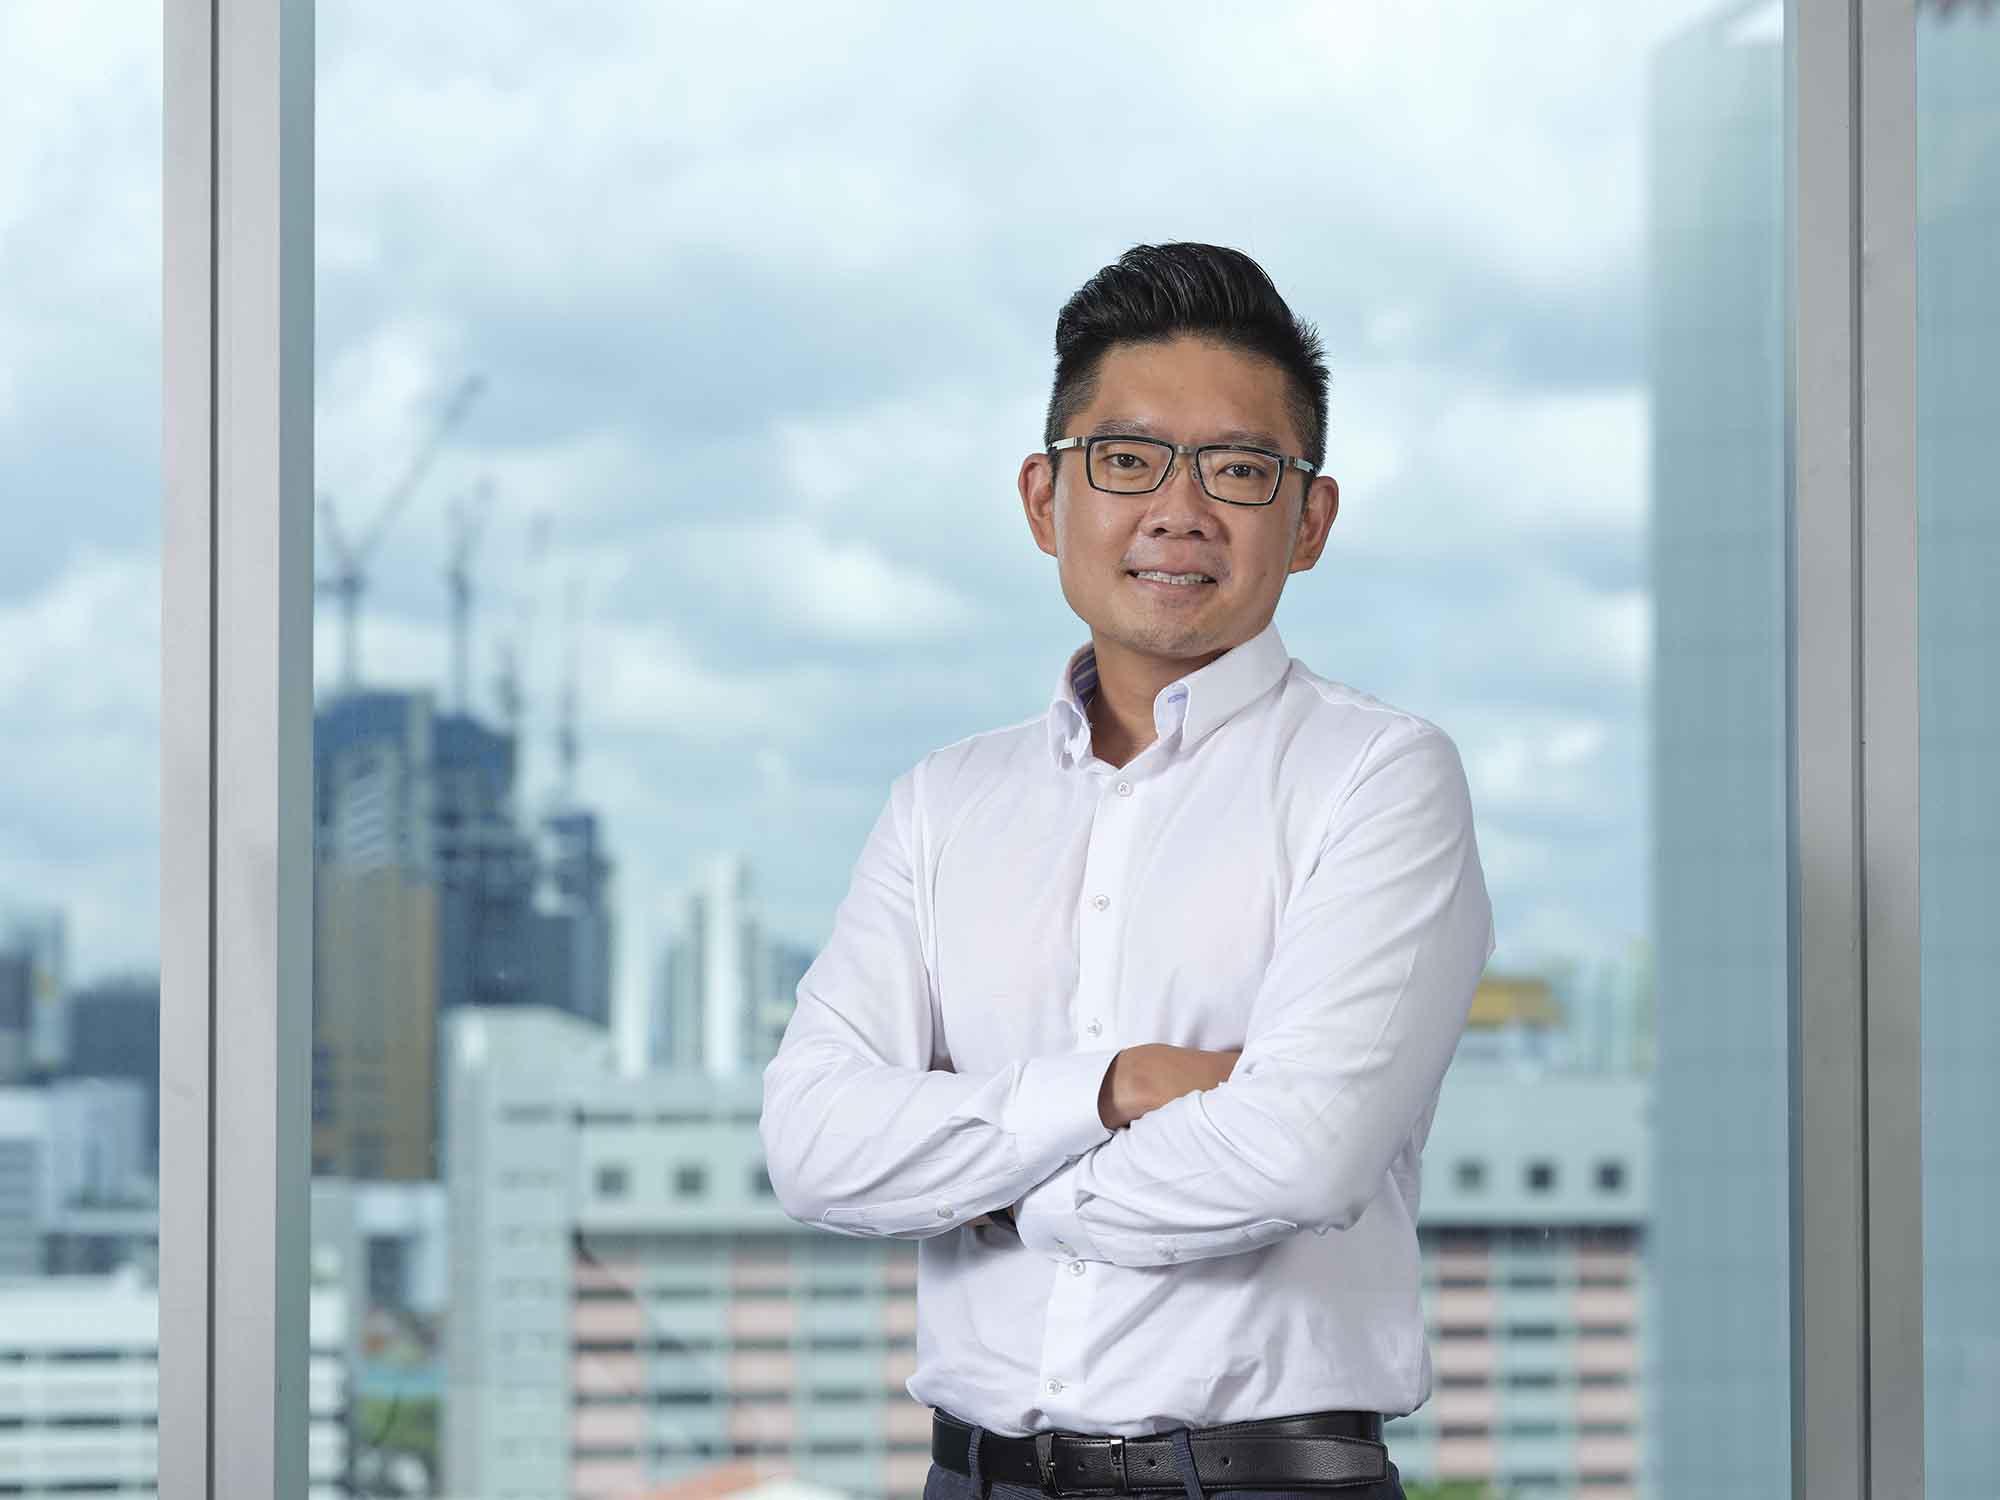 Headshot Photography Portrait Photographer Singapore COCO Creative Studio 19